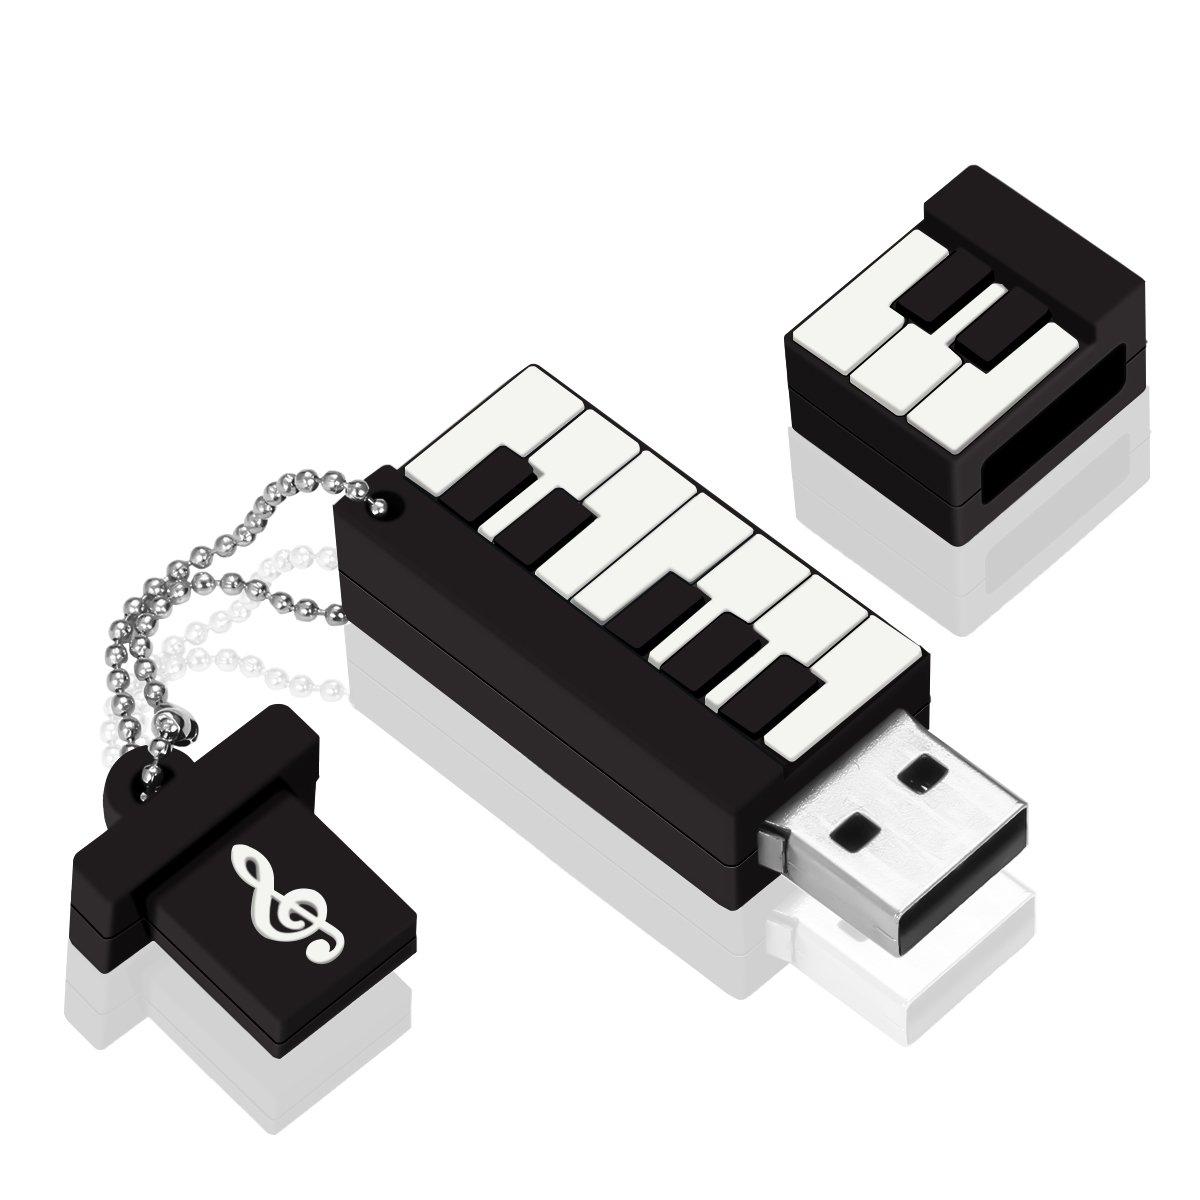 Clé USB 16 GO PIANO